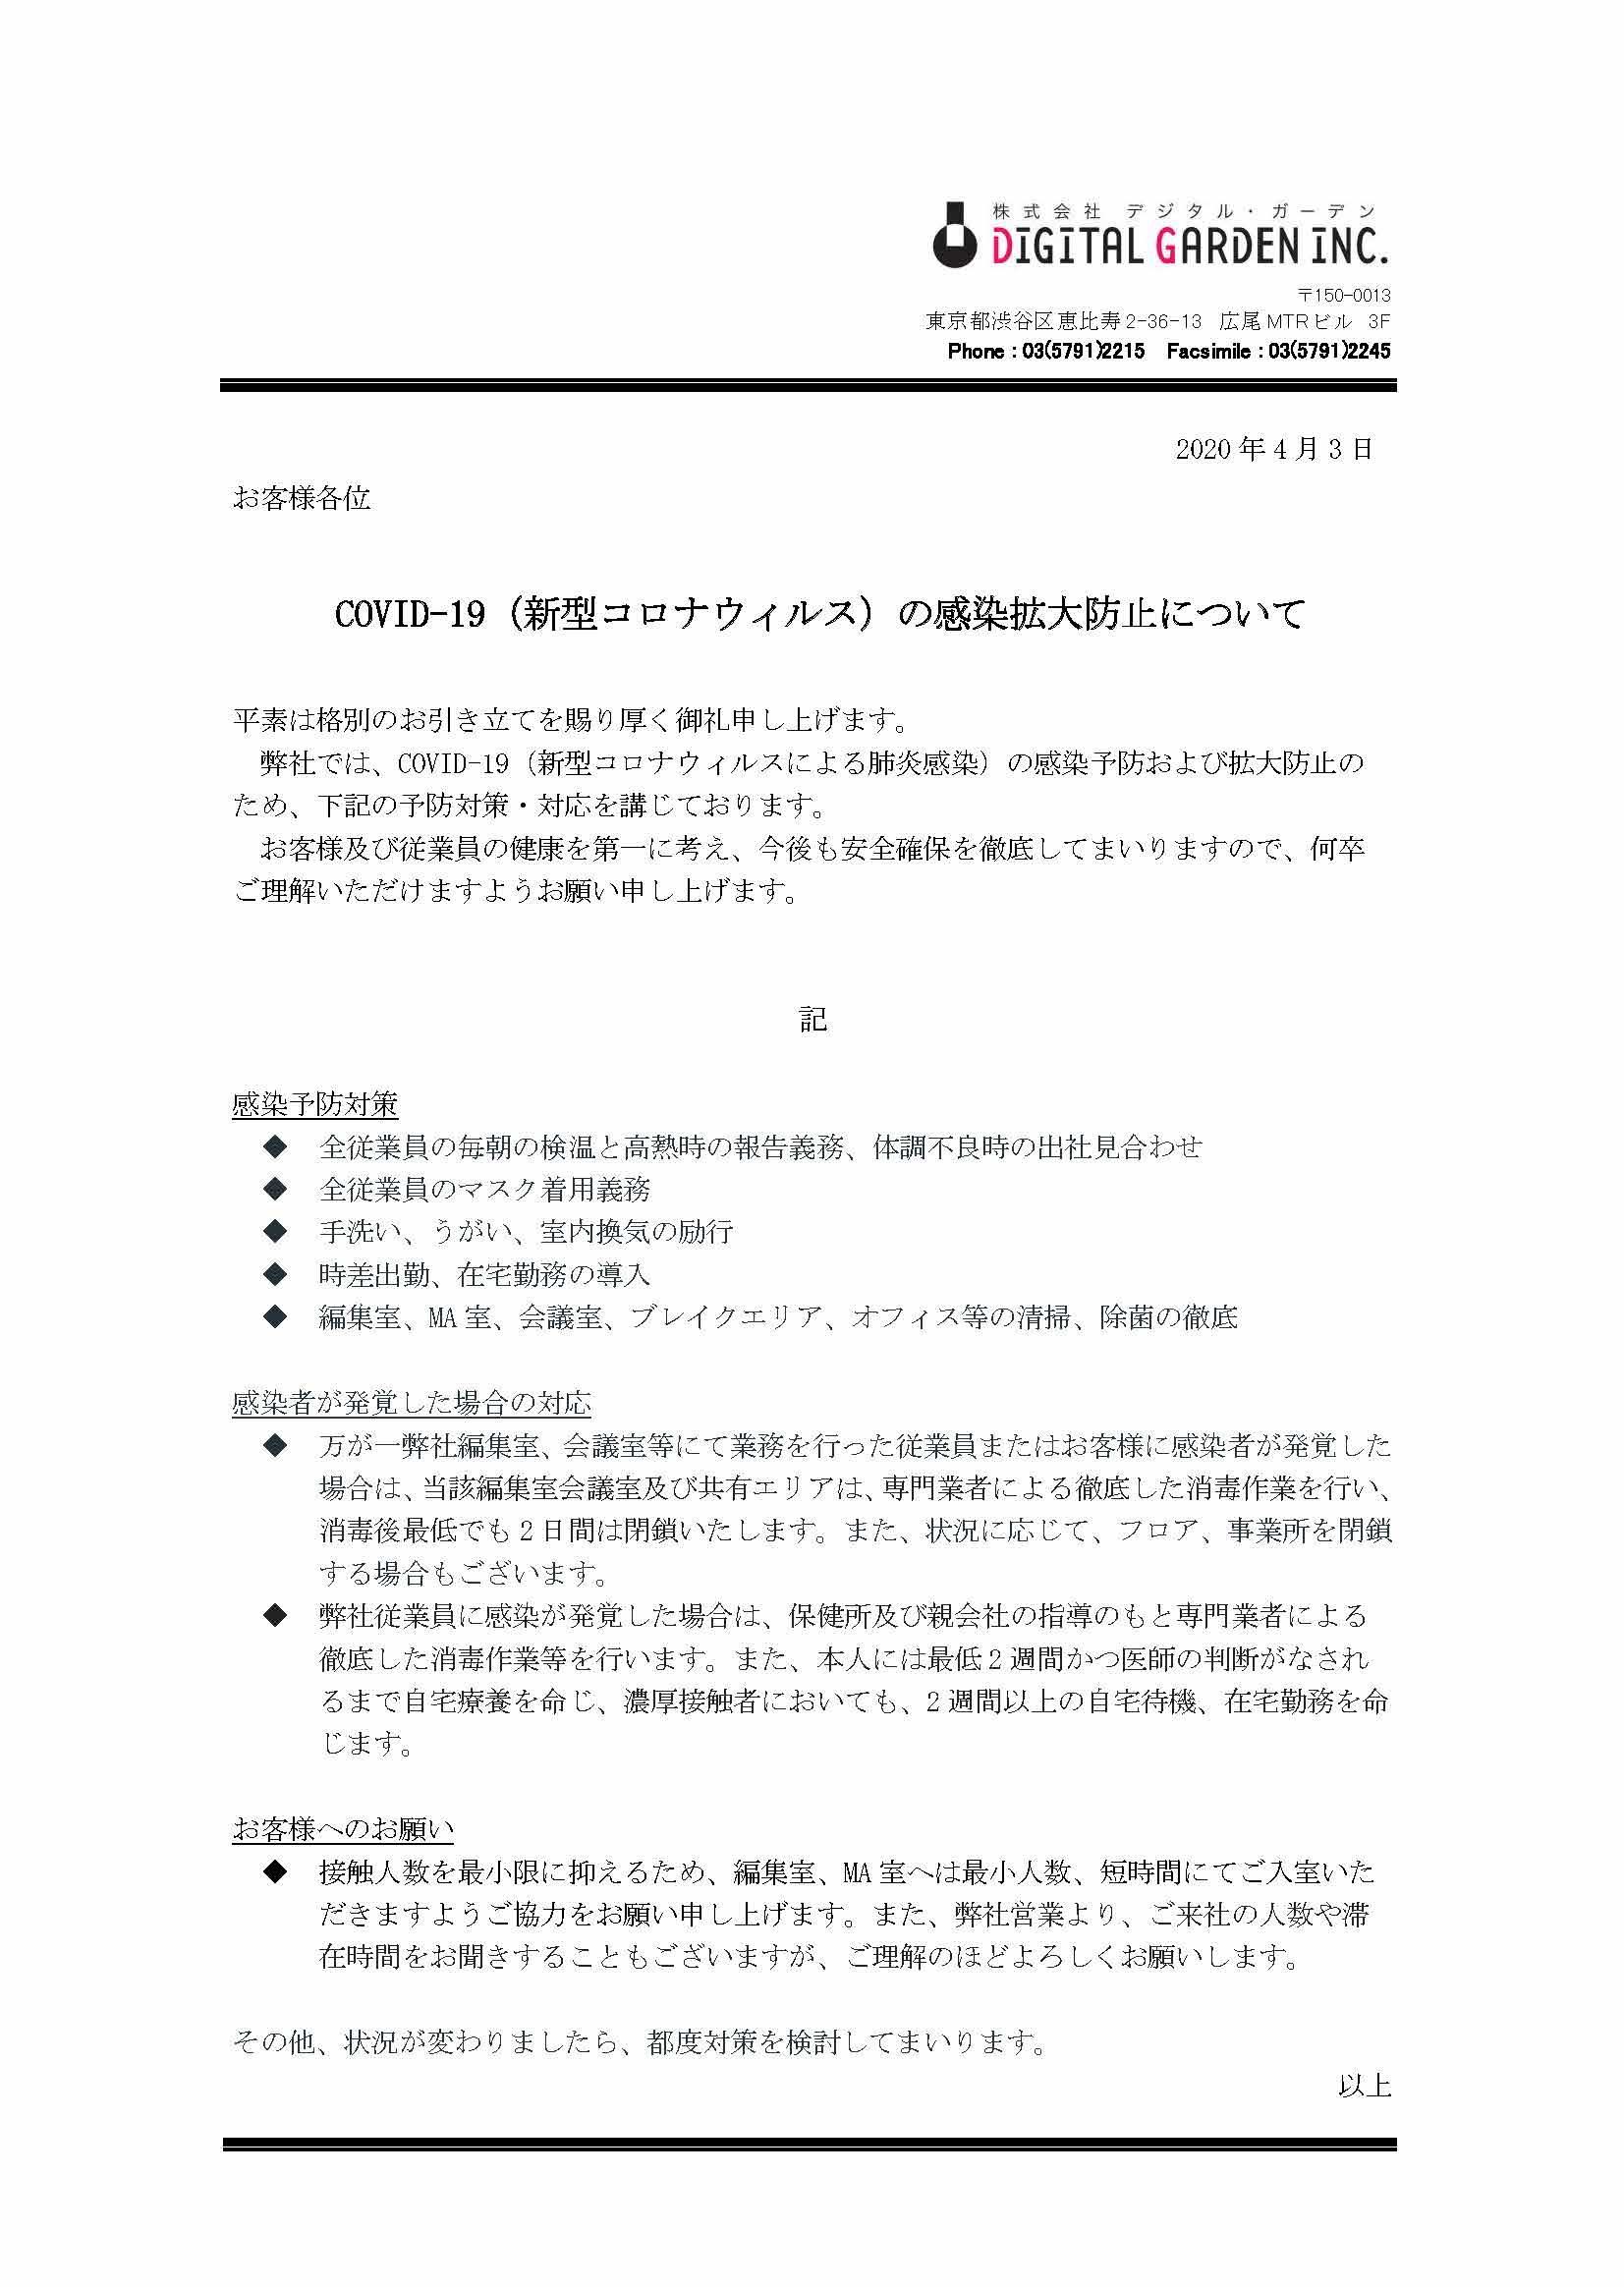 DGI_20200403コロナ対応のお知らせ